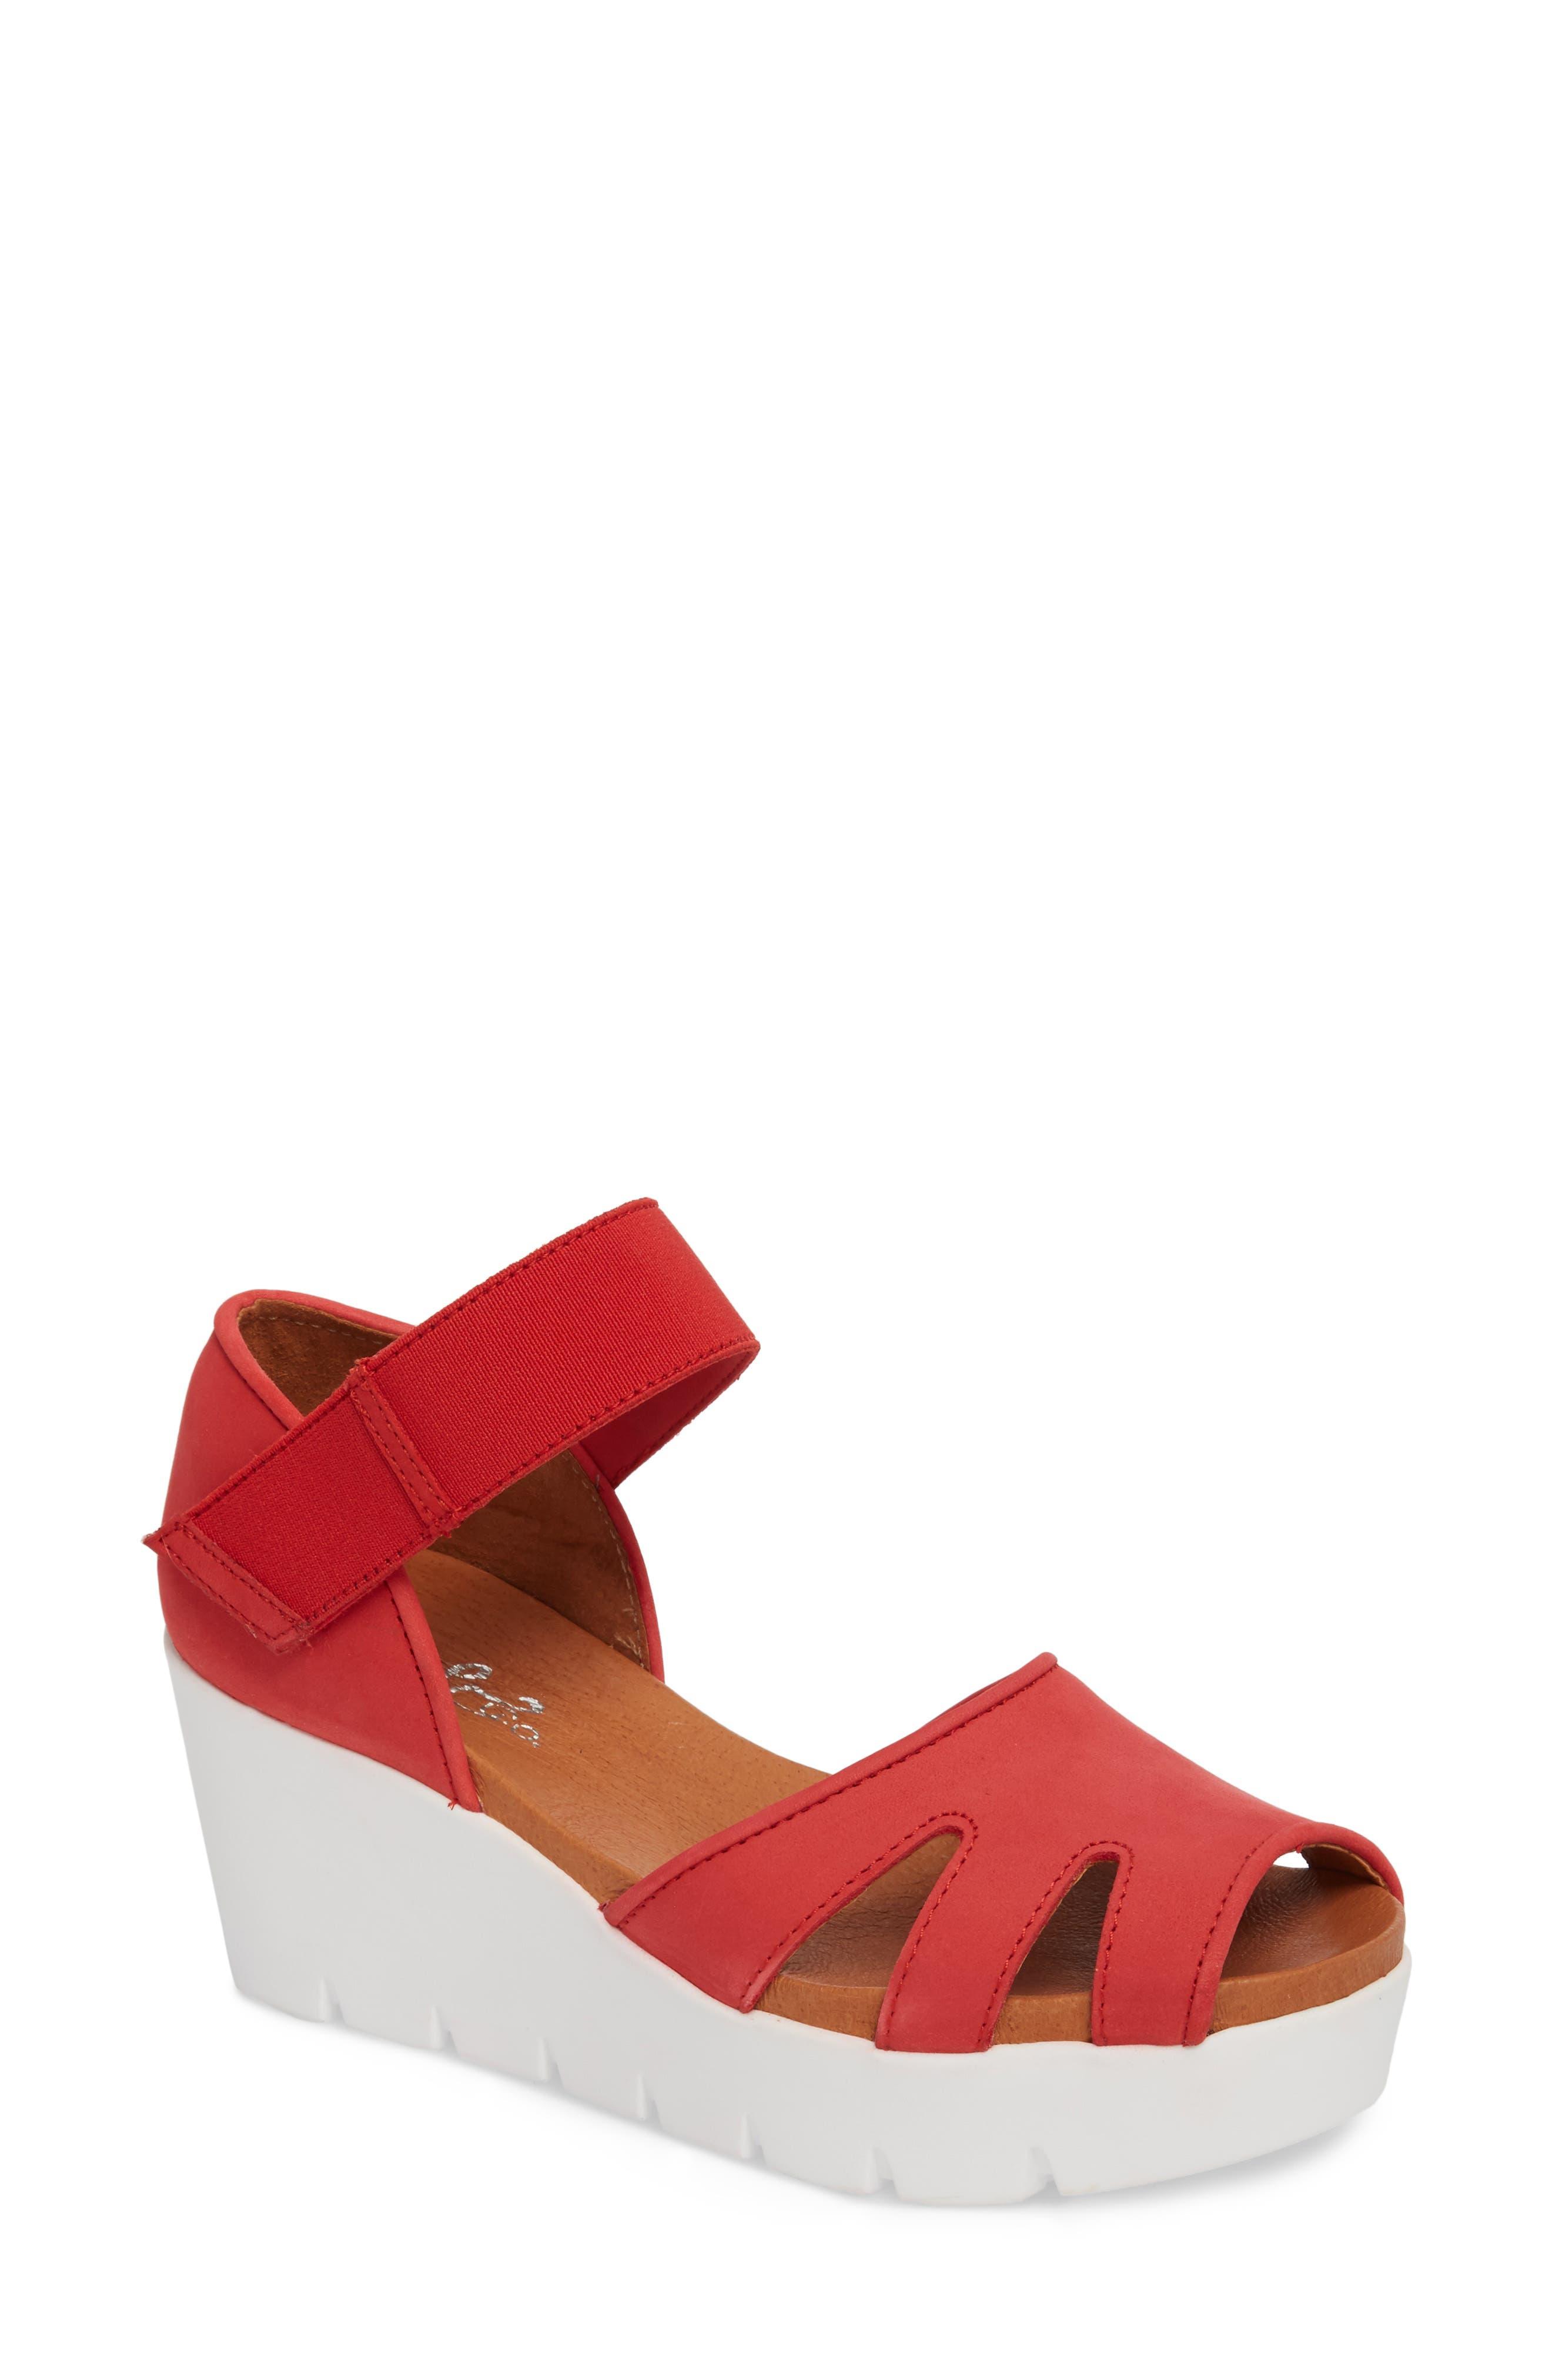 Sharon Platform Wedge Sandal,                             Main thumbnail 1, color,                             Red Nubuck Leather